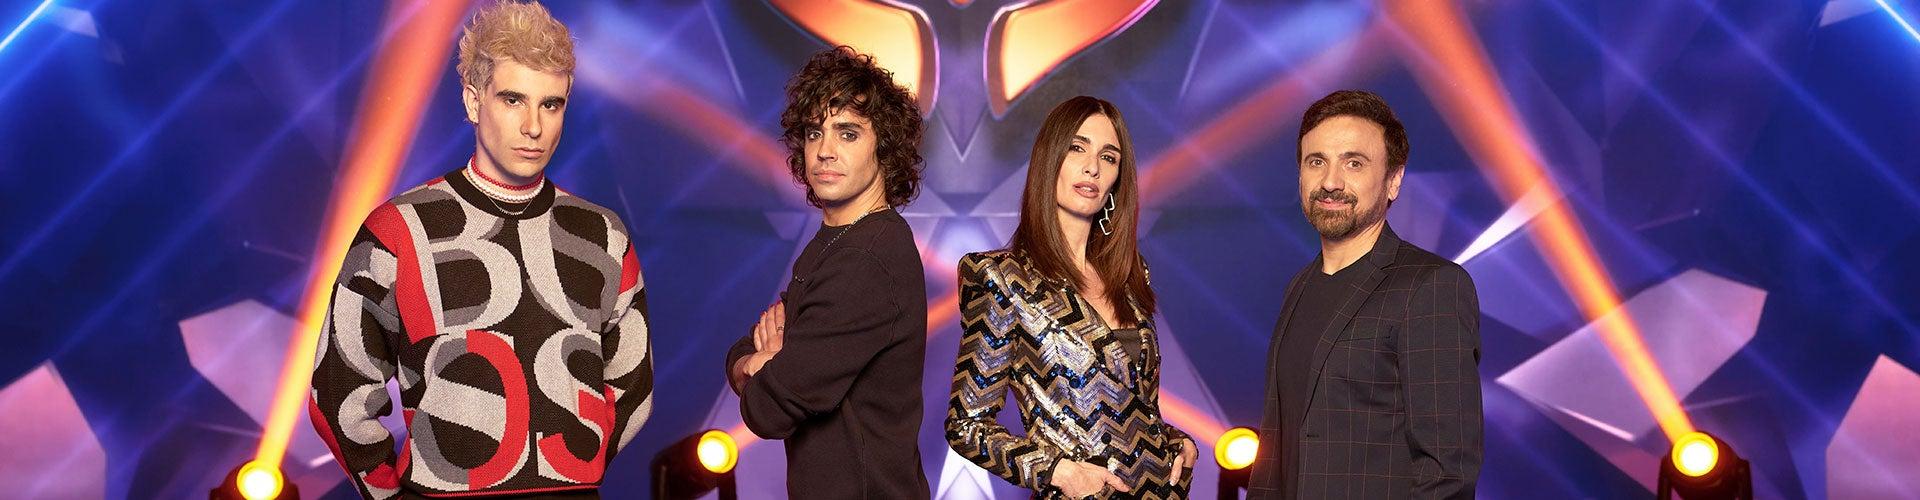 Investigadores segunda temporada Mask Singer